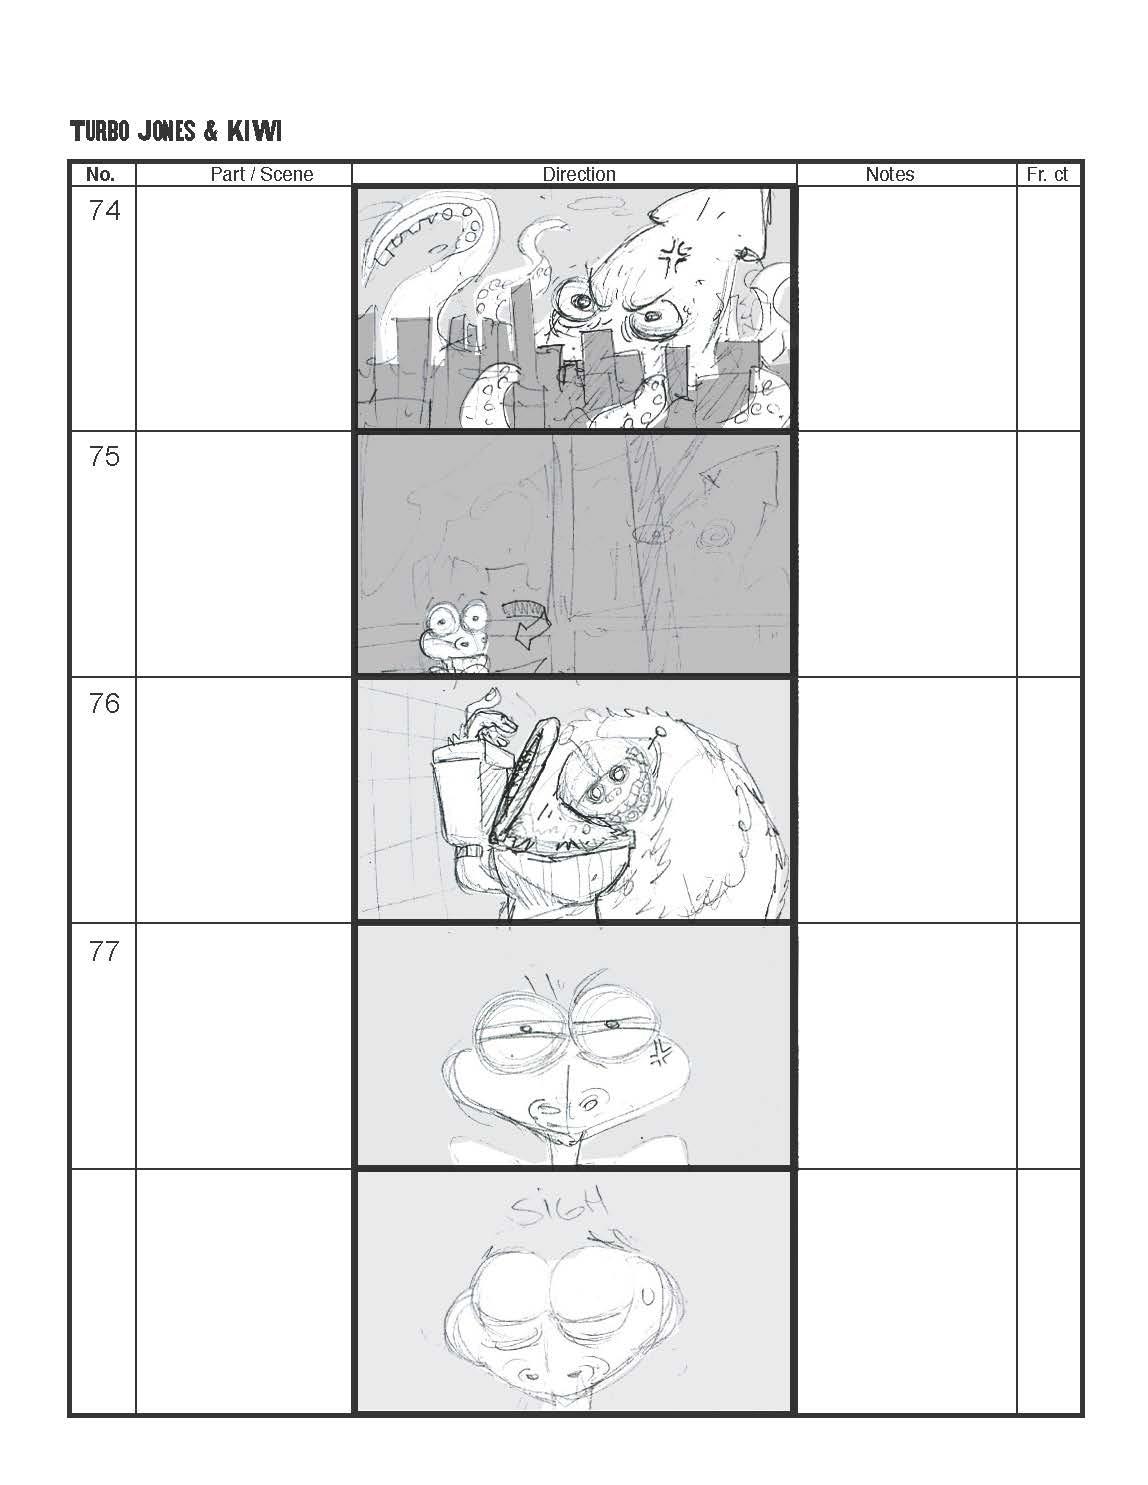 TJK_Storyboards_v01_HIGH_Page_36.jpg